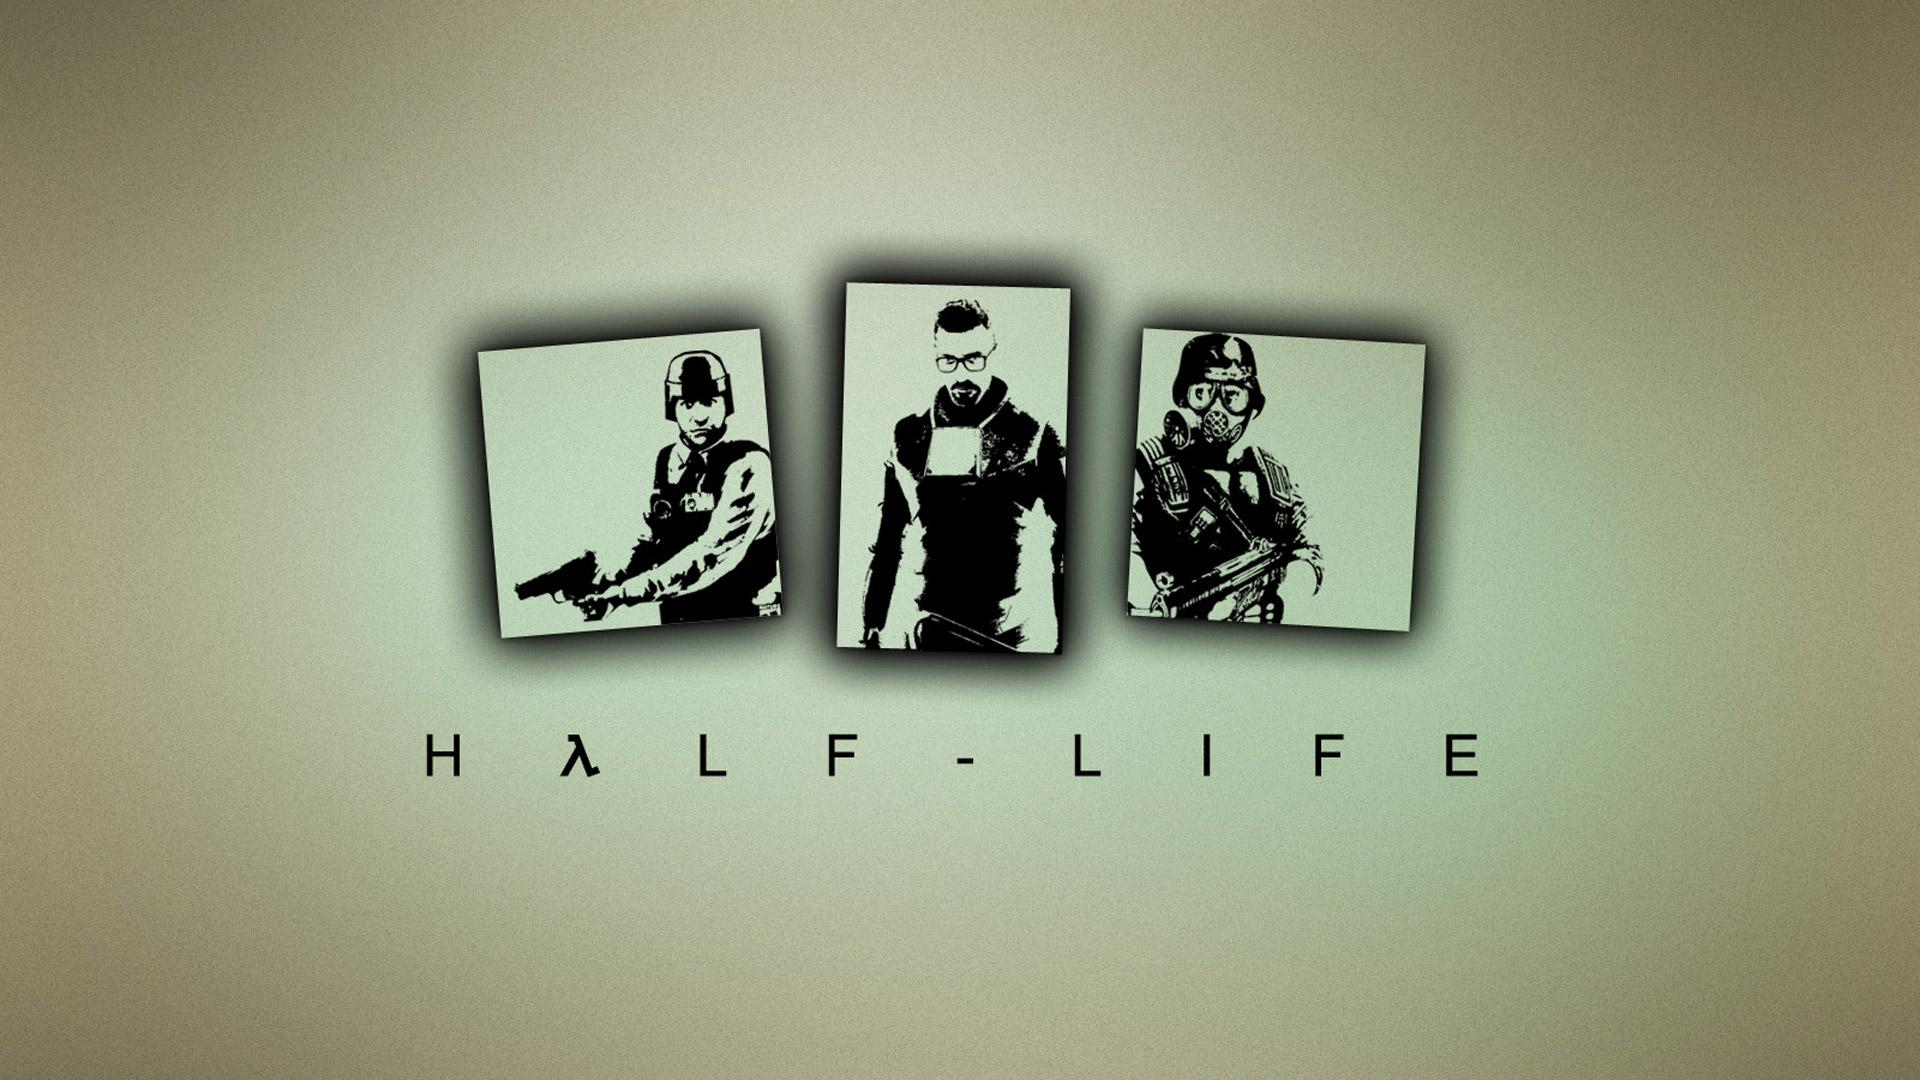 Free Half-Life Wallpaper in 1920x1080